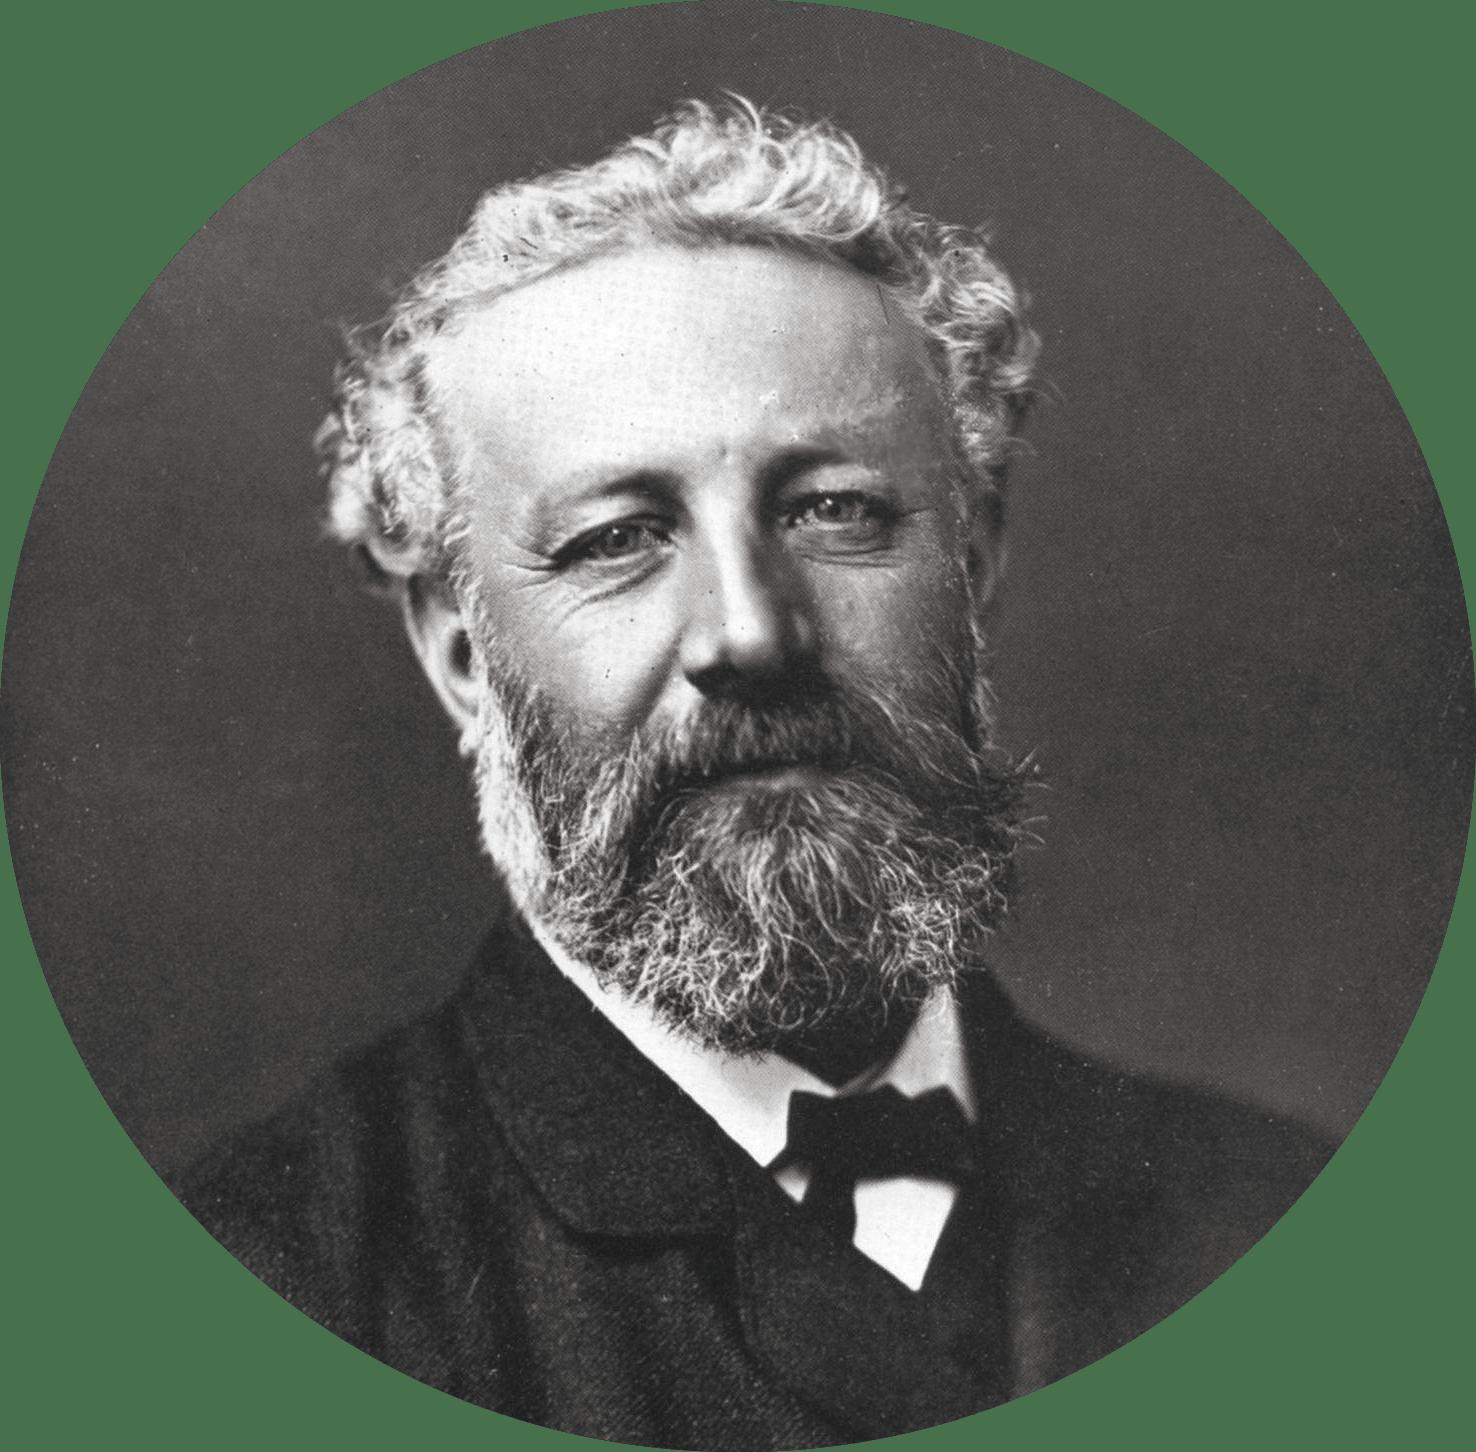 Photographie Jules Verne